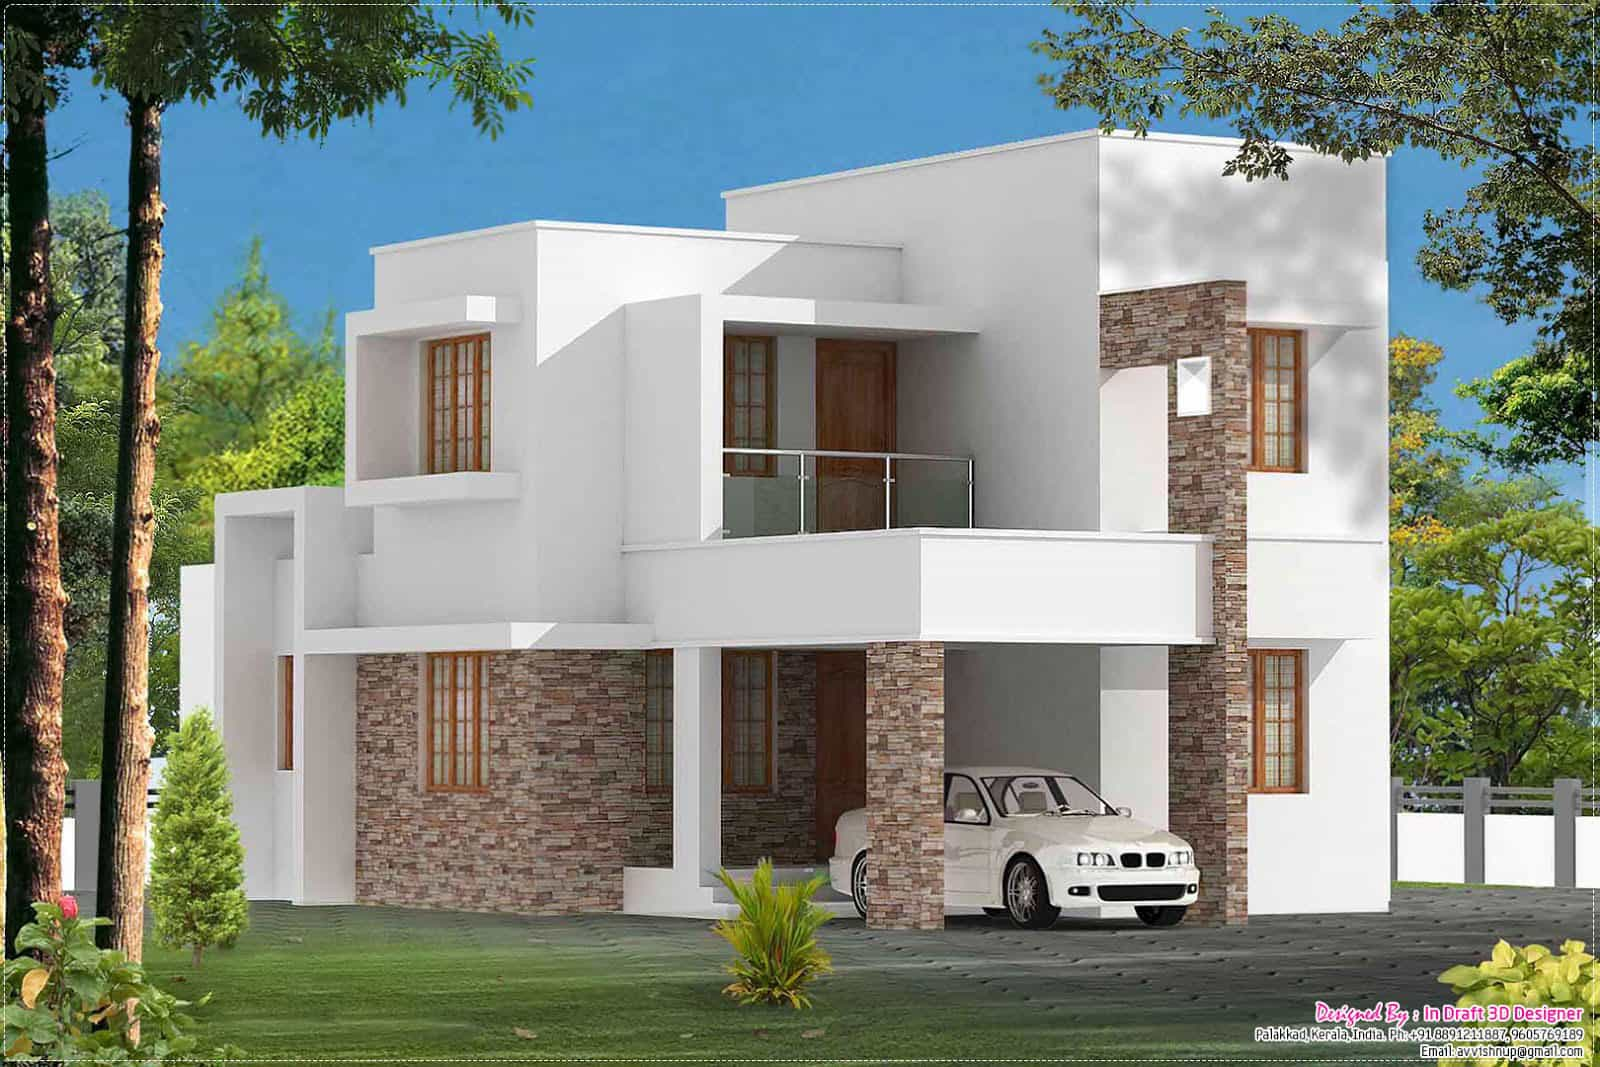 3 Bedroom Contemporary Kerala Home At 1680 Sq Ft